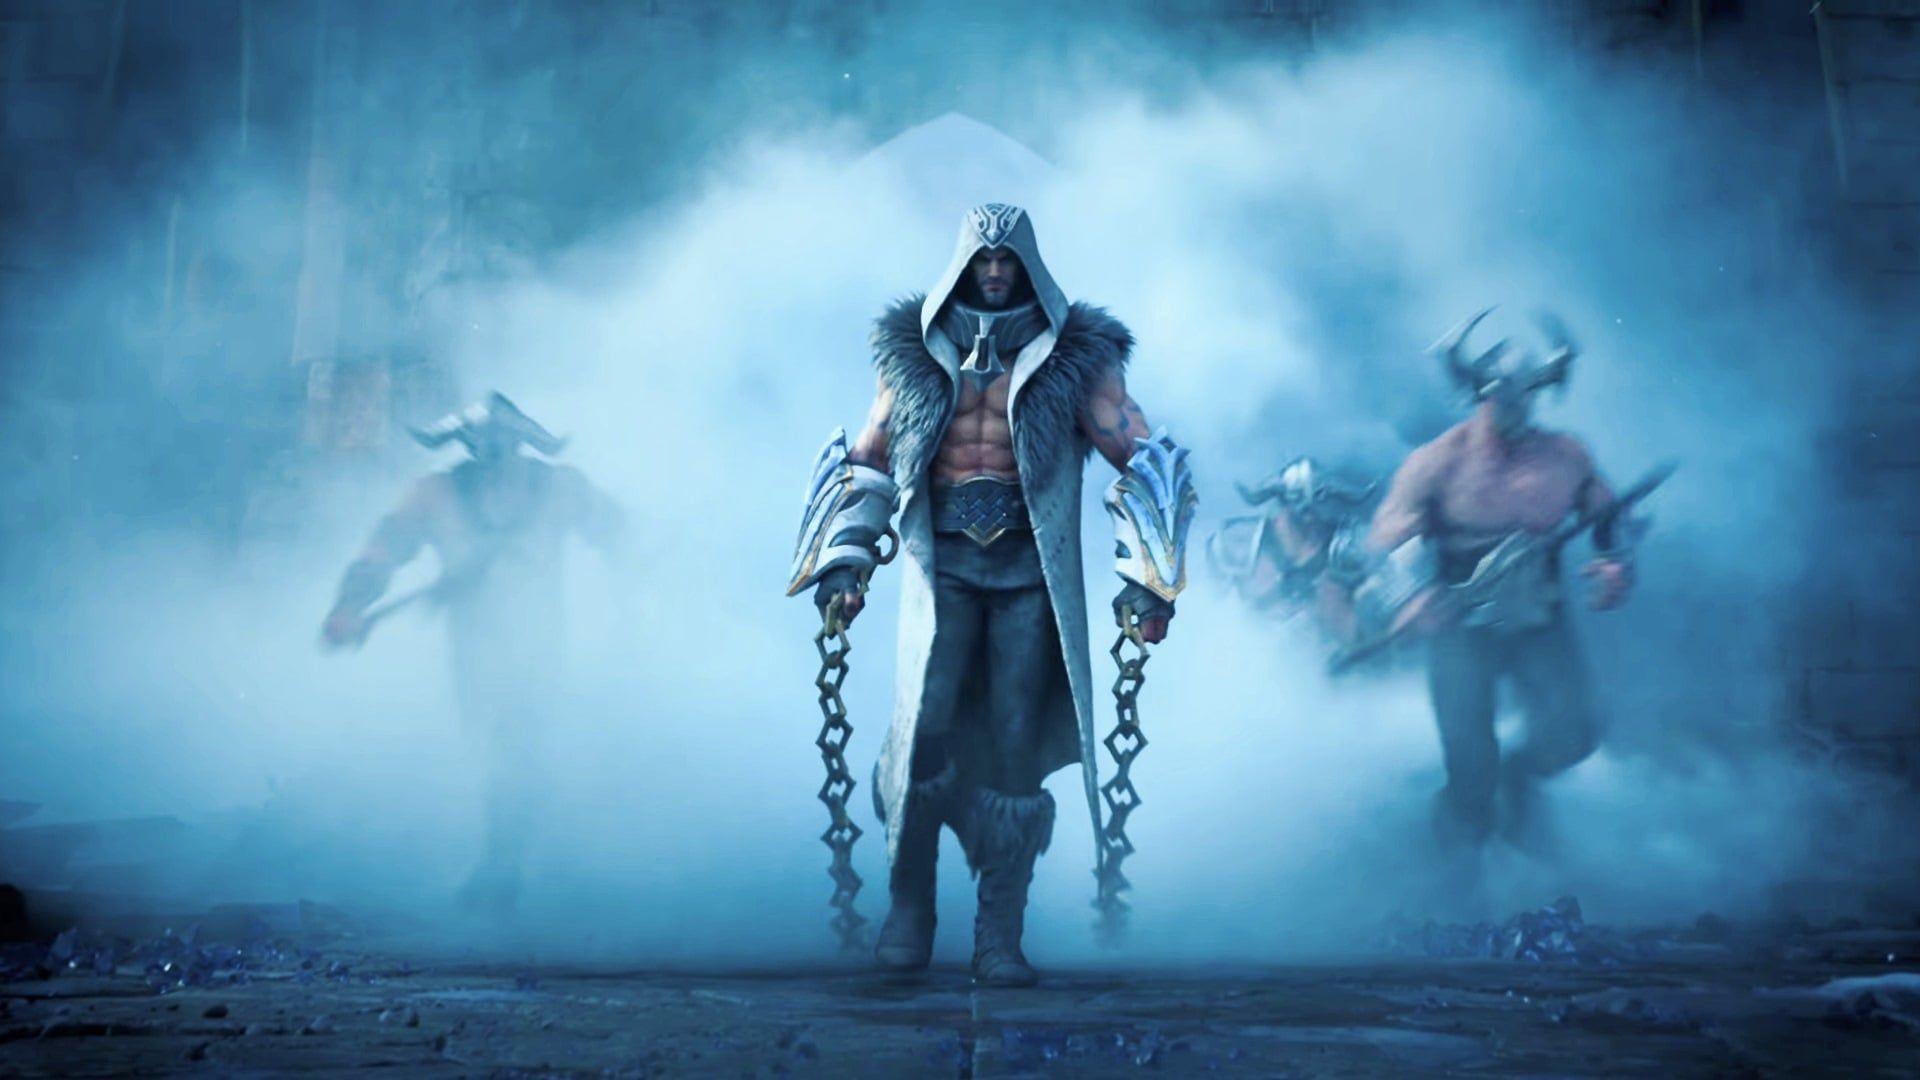 League Of Legends 2020 Warriors Cinematic Wallpapers in 2020